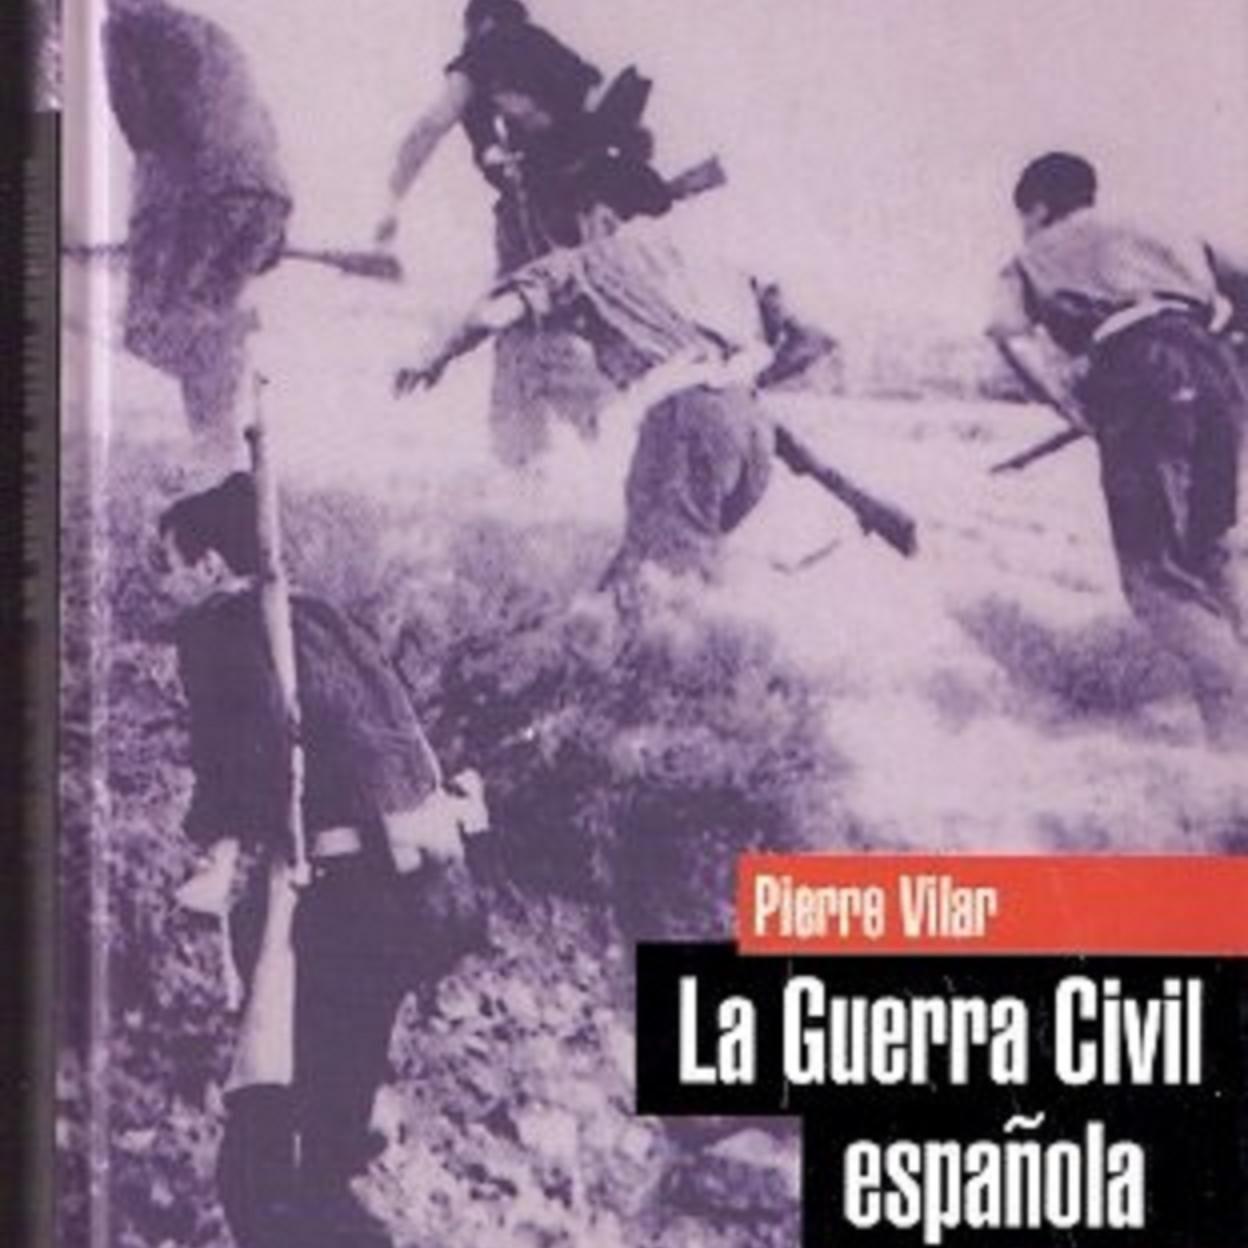 La guerra civil espanola de Pierre Vilar